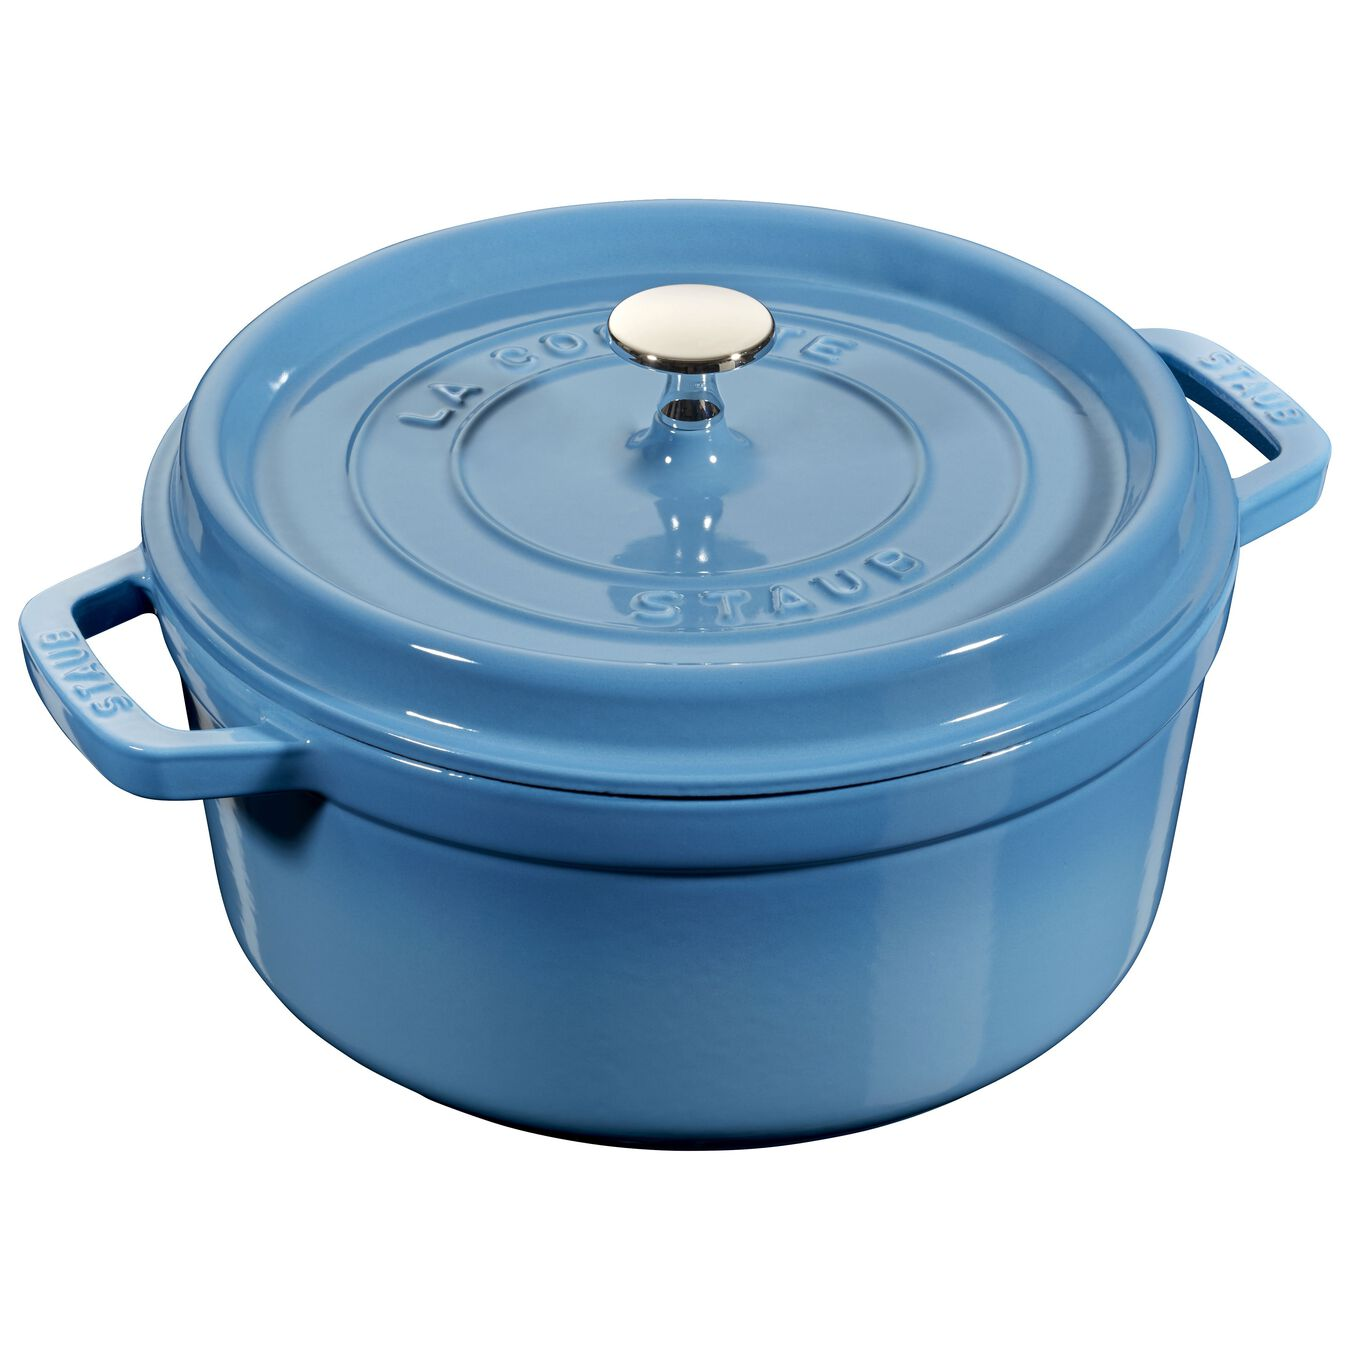 5.25 l Cast iron round Cocotte, Ice-Blue,,large 1